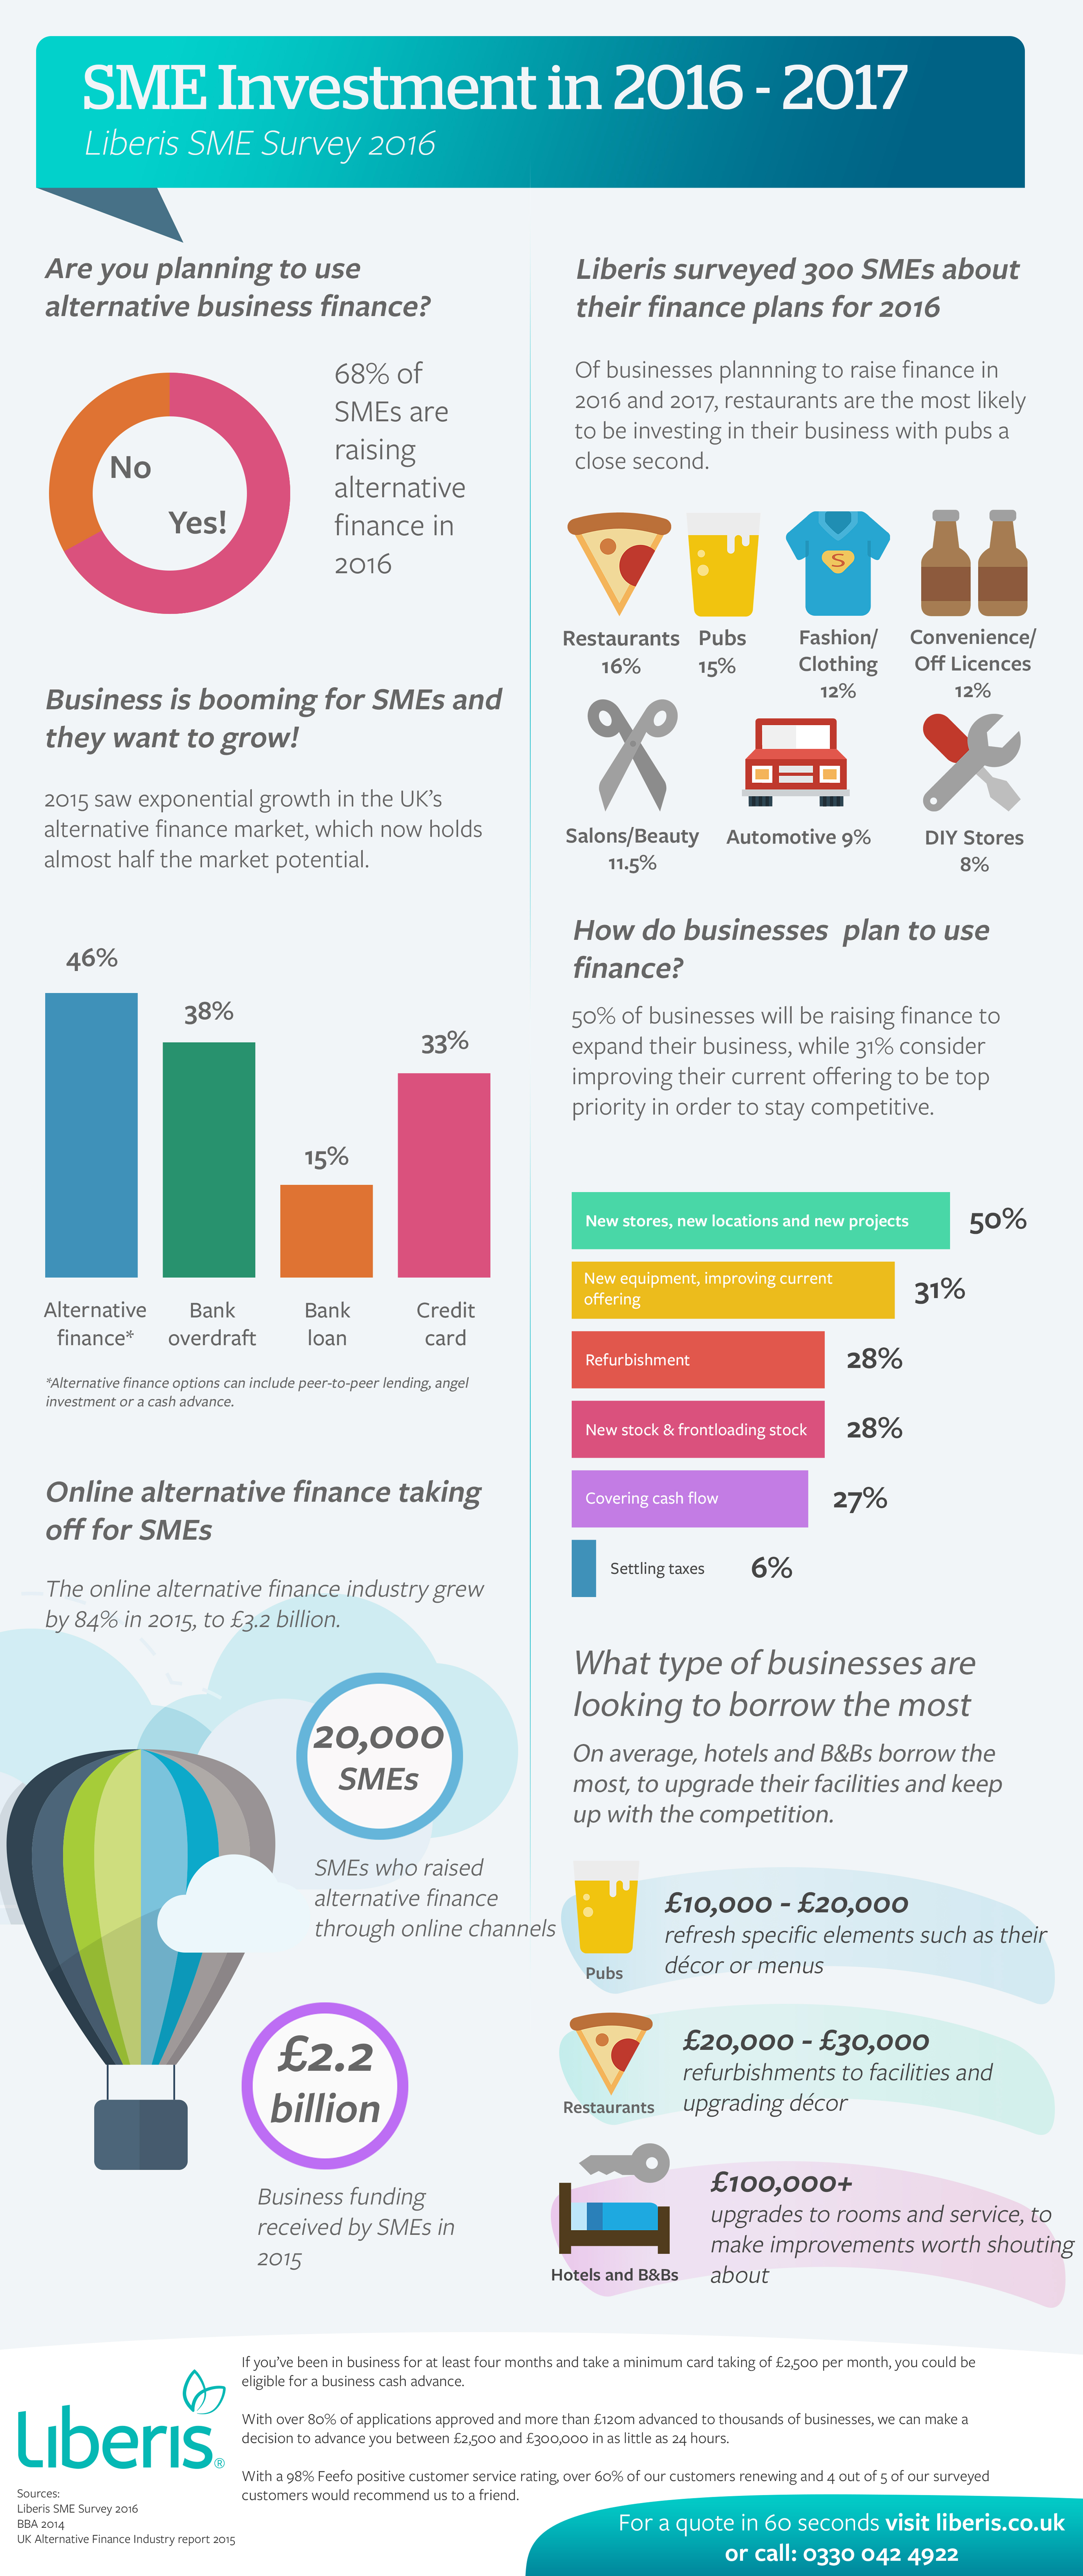 Liberis SME Survey Results